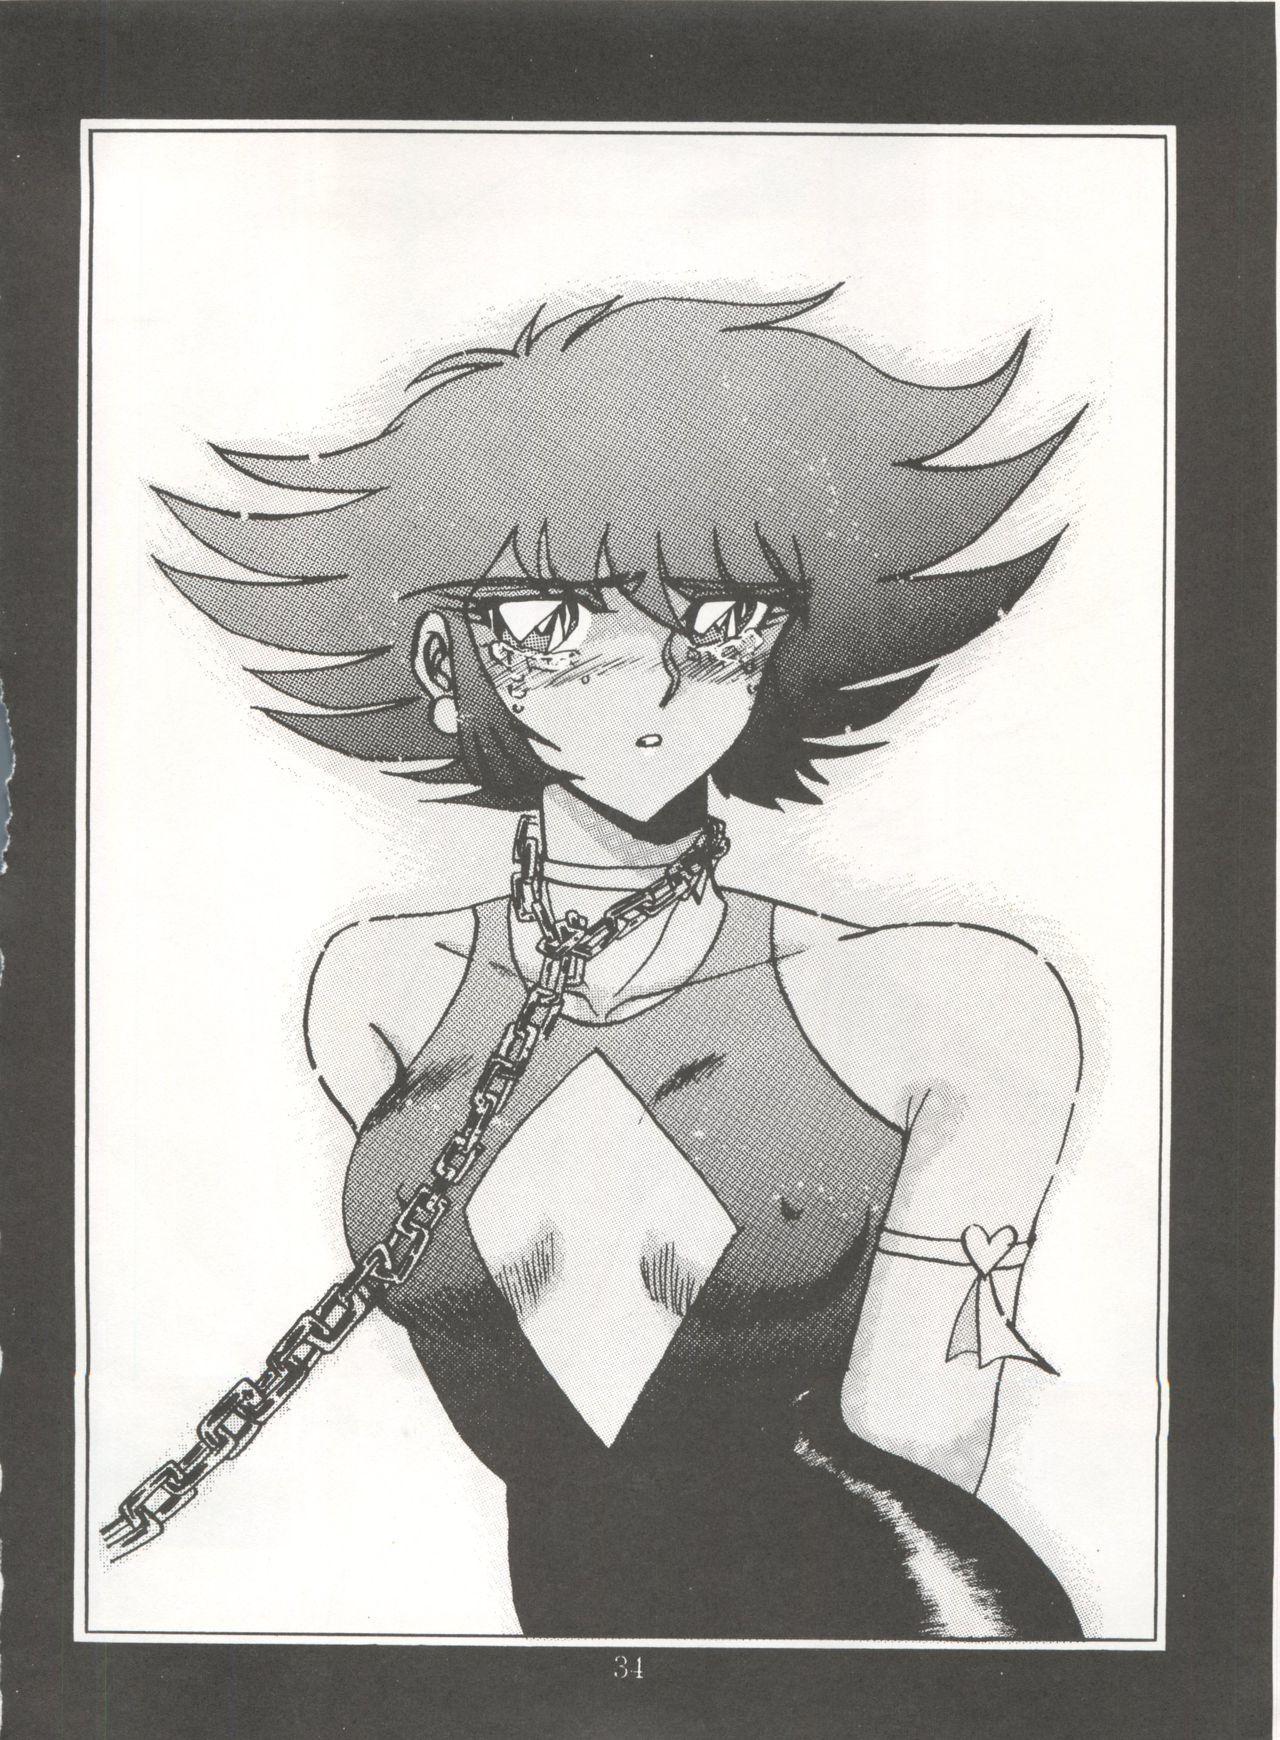 [Global One (MARO)] Sadistic 5 (Cutey Honey, Devilman, Sailor Moon), [Global One (MARO)] Sadistic (Dirty Pair, Fushigi no Umi no Nadia, Sailor Moon), [Studio Ikkatsumajin] .ribbon (Hime-chan's Ribbon) 33